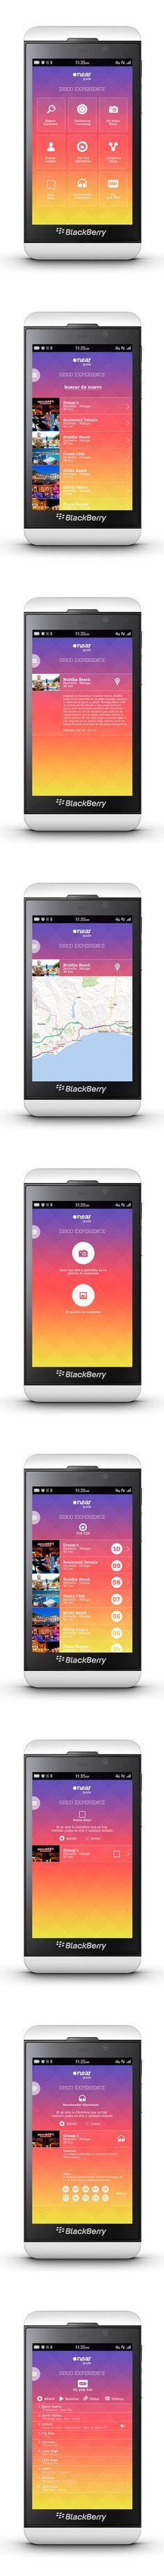 Blackberry Z10 - disco app conception, via spaincreative